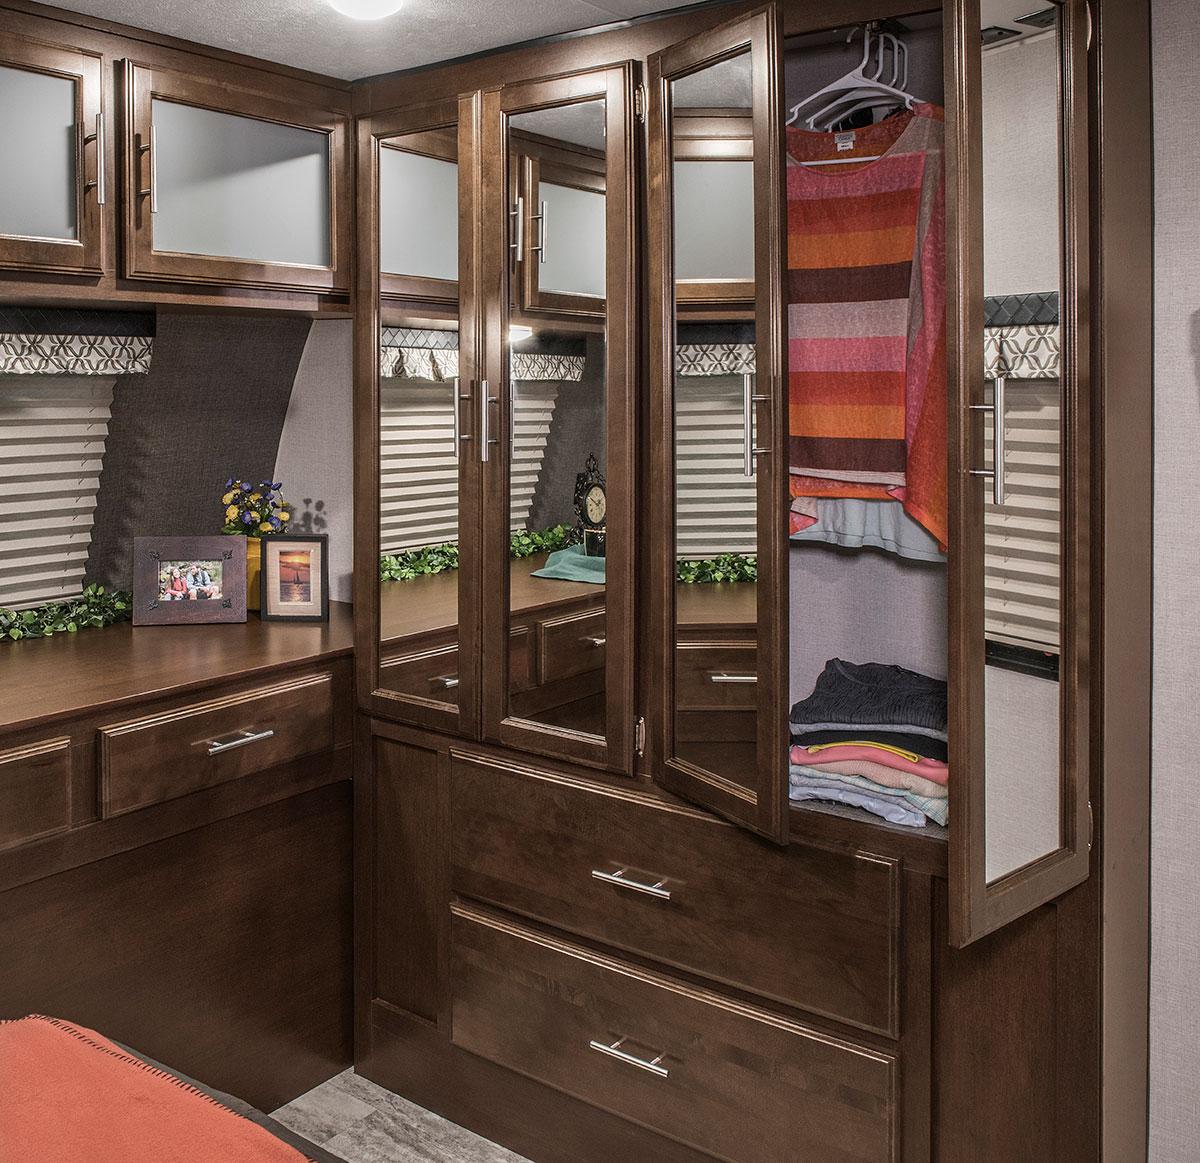 2018 Spree S333rlf Luxury Lightweight Travel Trailer Kz Rv